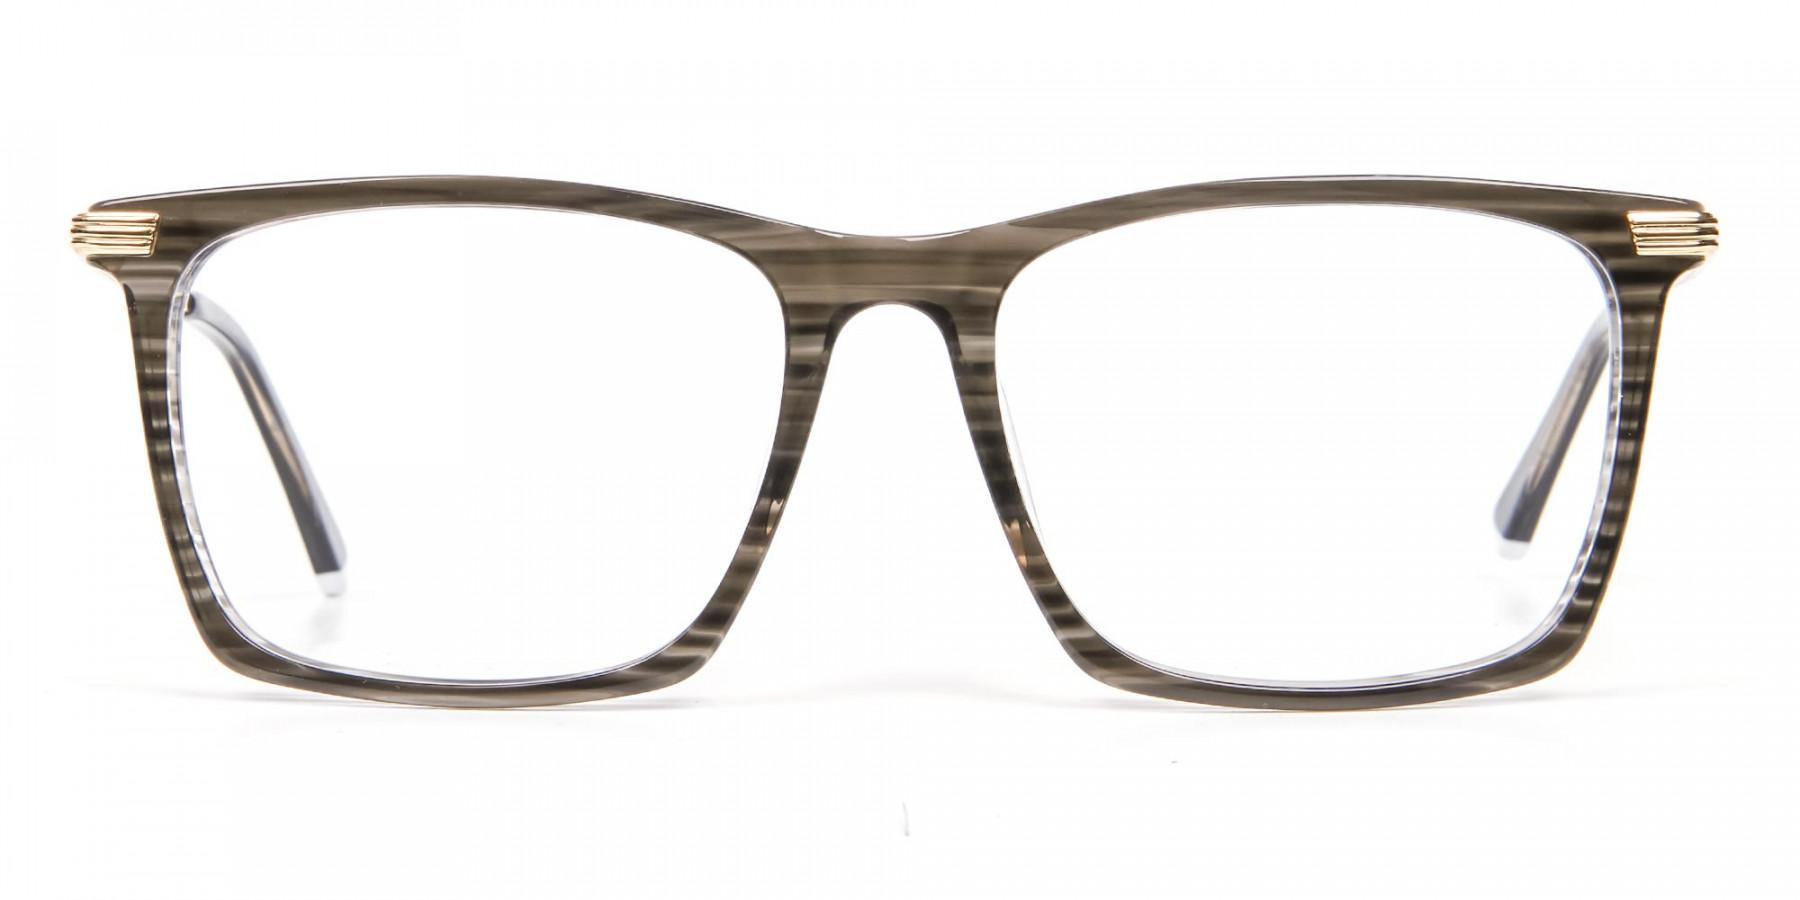 Black Wooden Textured Glasses- 1